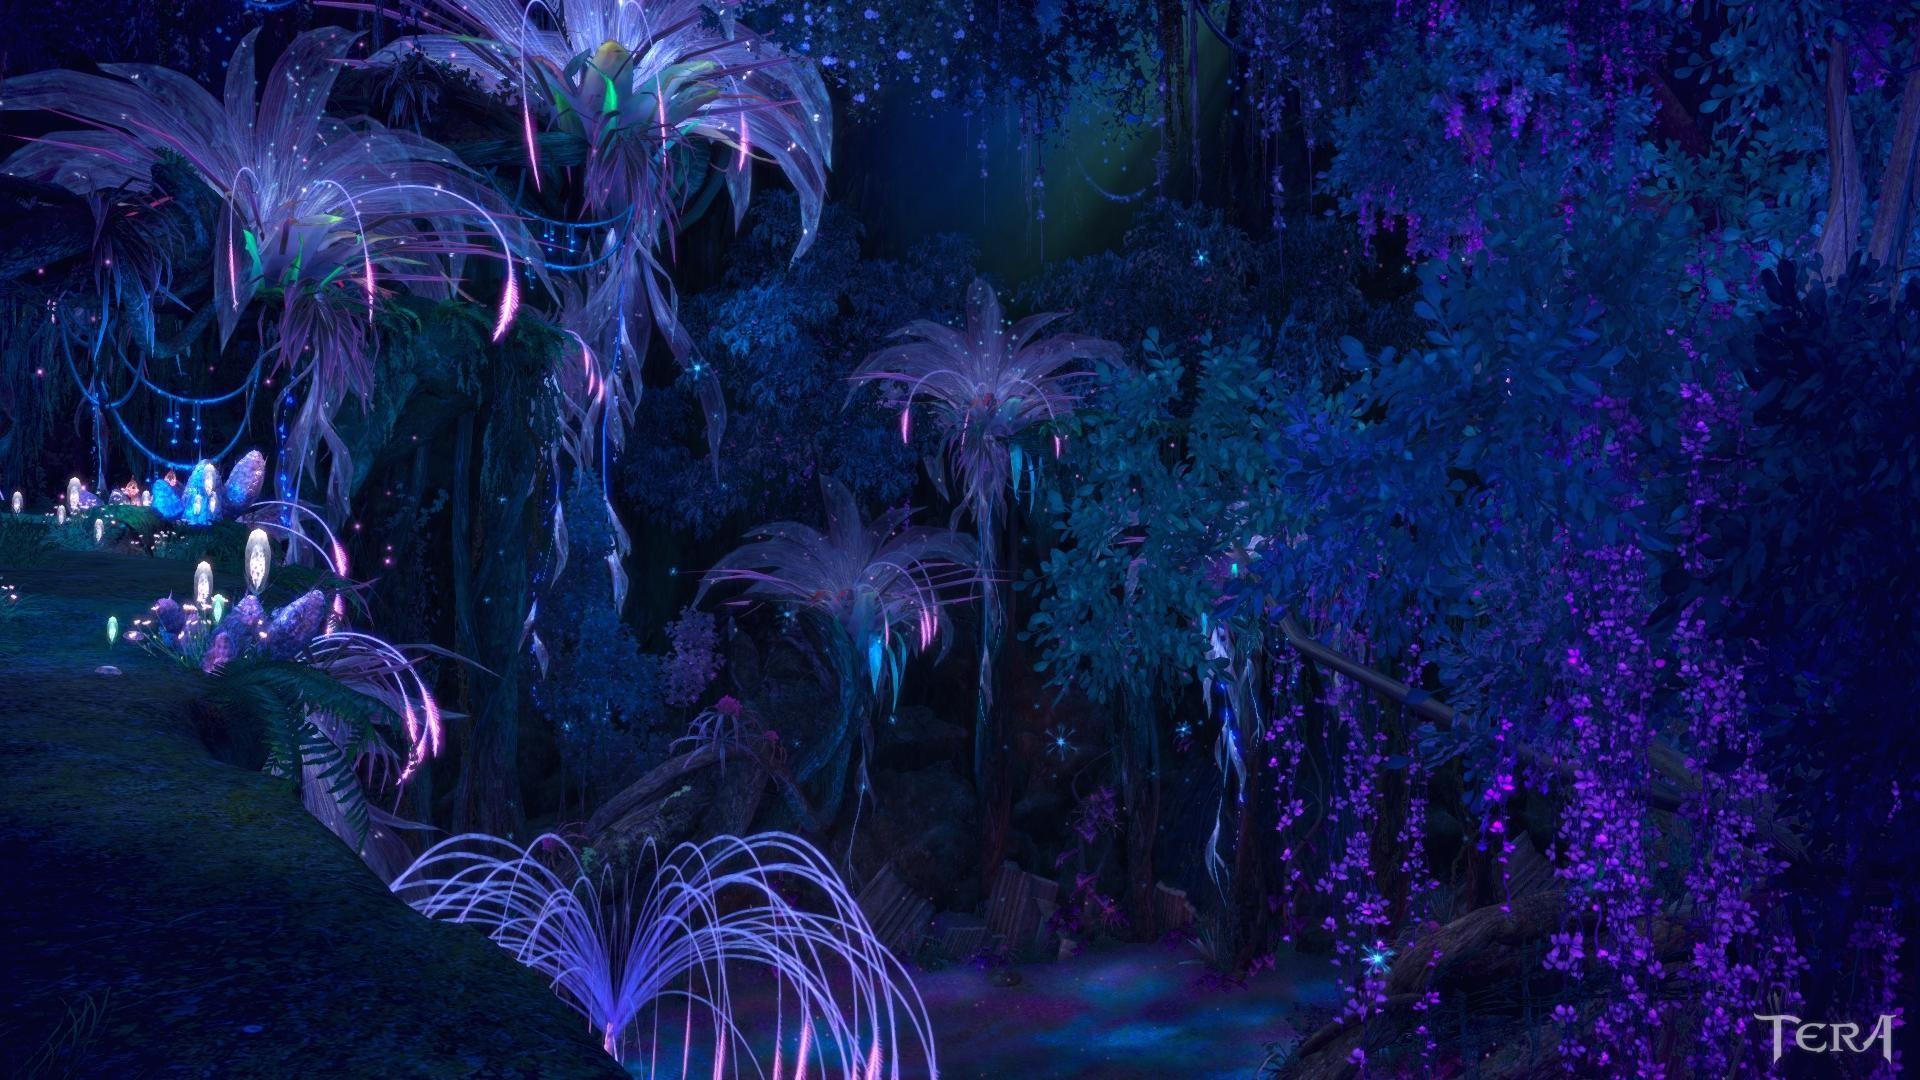 Mystical Wallpapers for Desktop (57+ images)